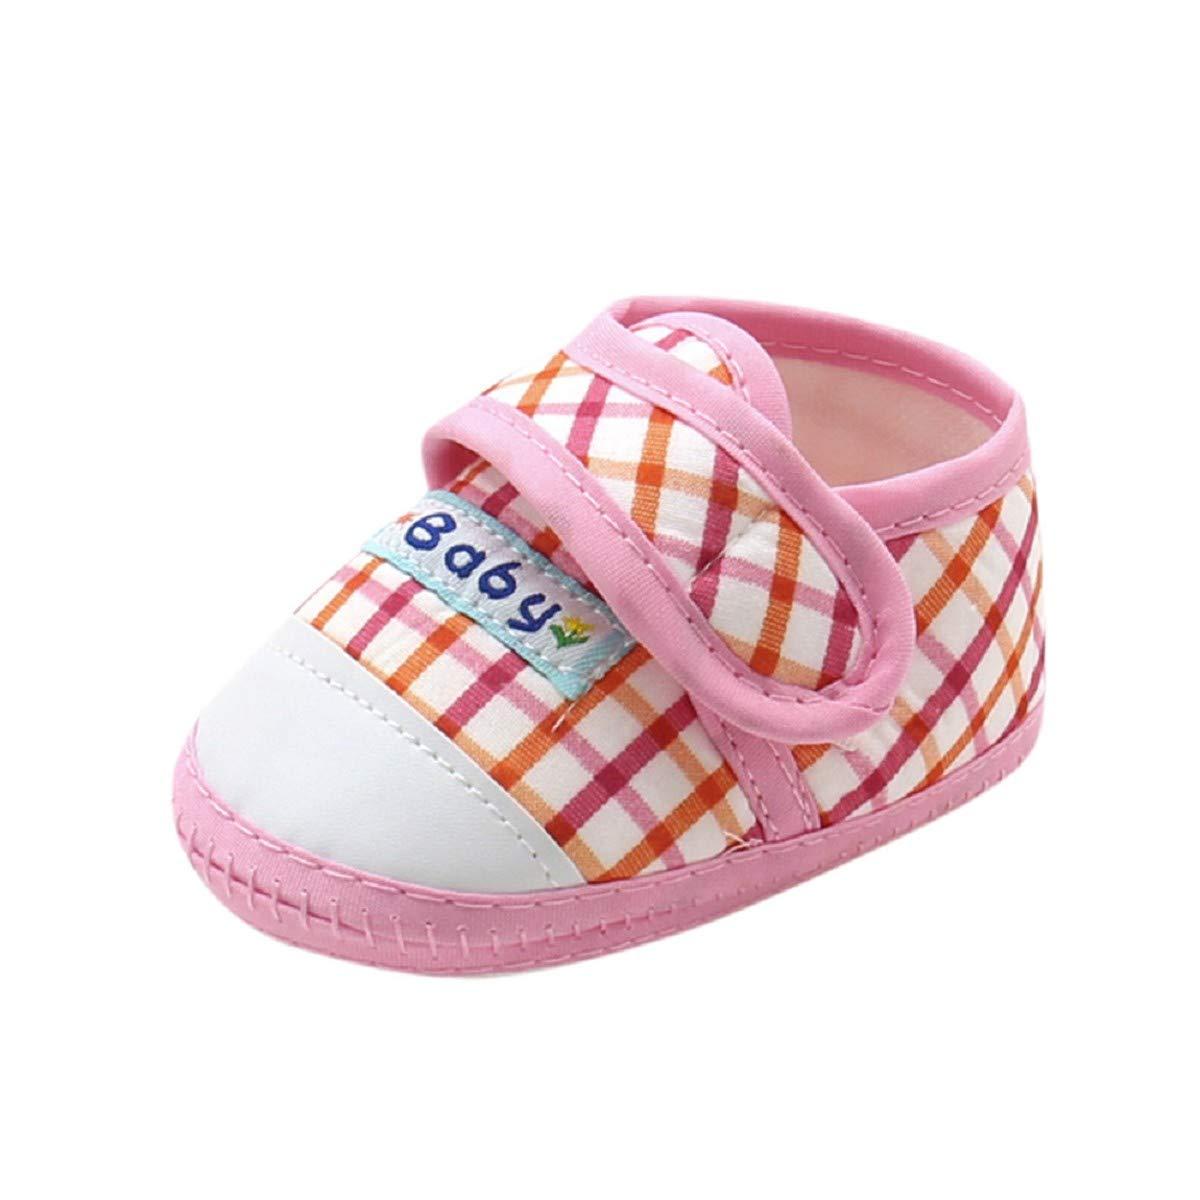 Toddler Canvas Shoes FAPIZI Newborn Infant Baby Boys Girls Soft Sole Prewalker Warm Casual Flats Shoes Pink